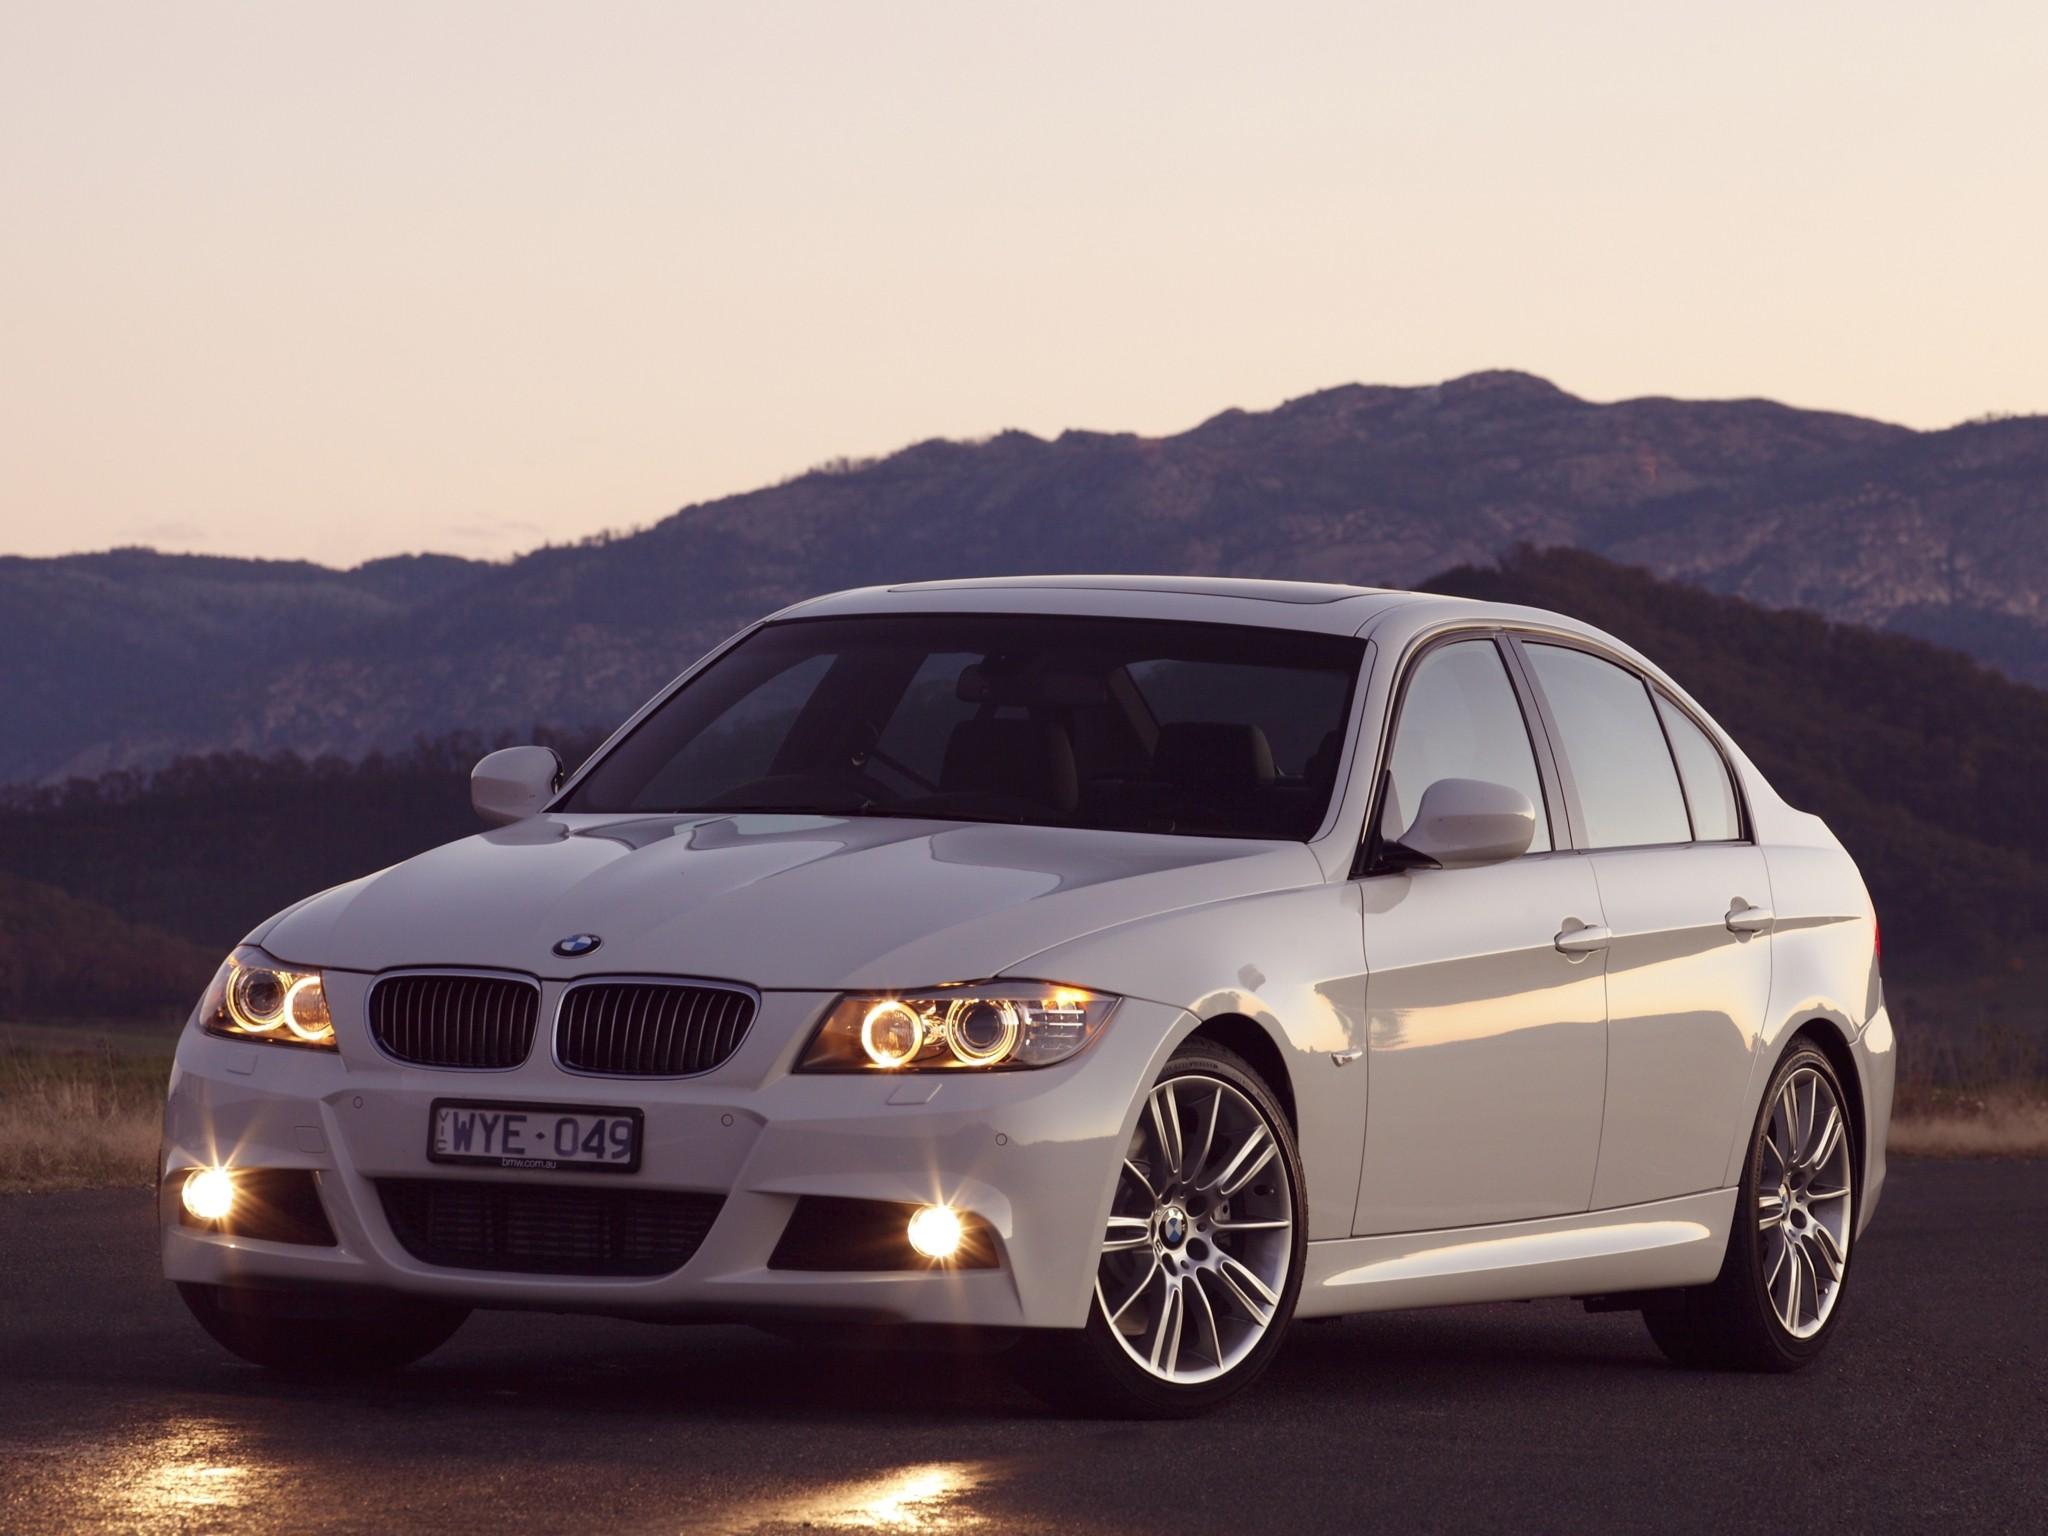 2011 BMW 328I Xdrive >> BMW 3 Series (E90) - 2008, 2009, 2010, 2011 - autoevolution